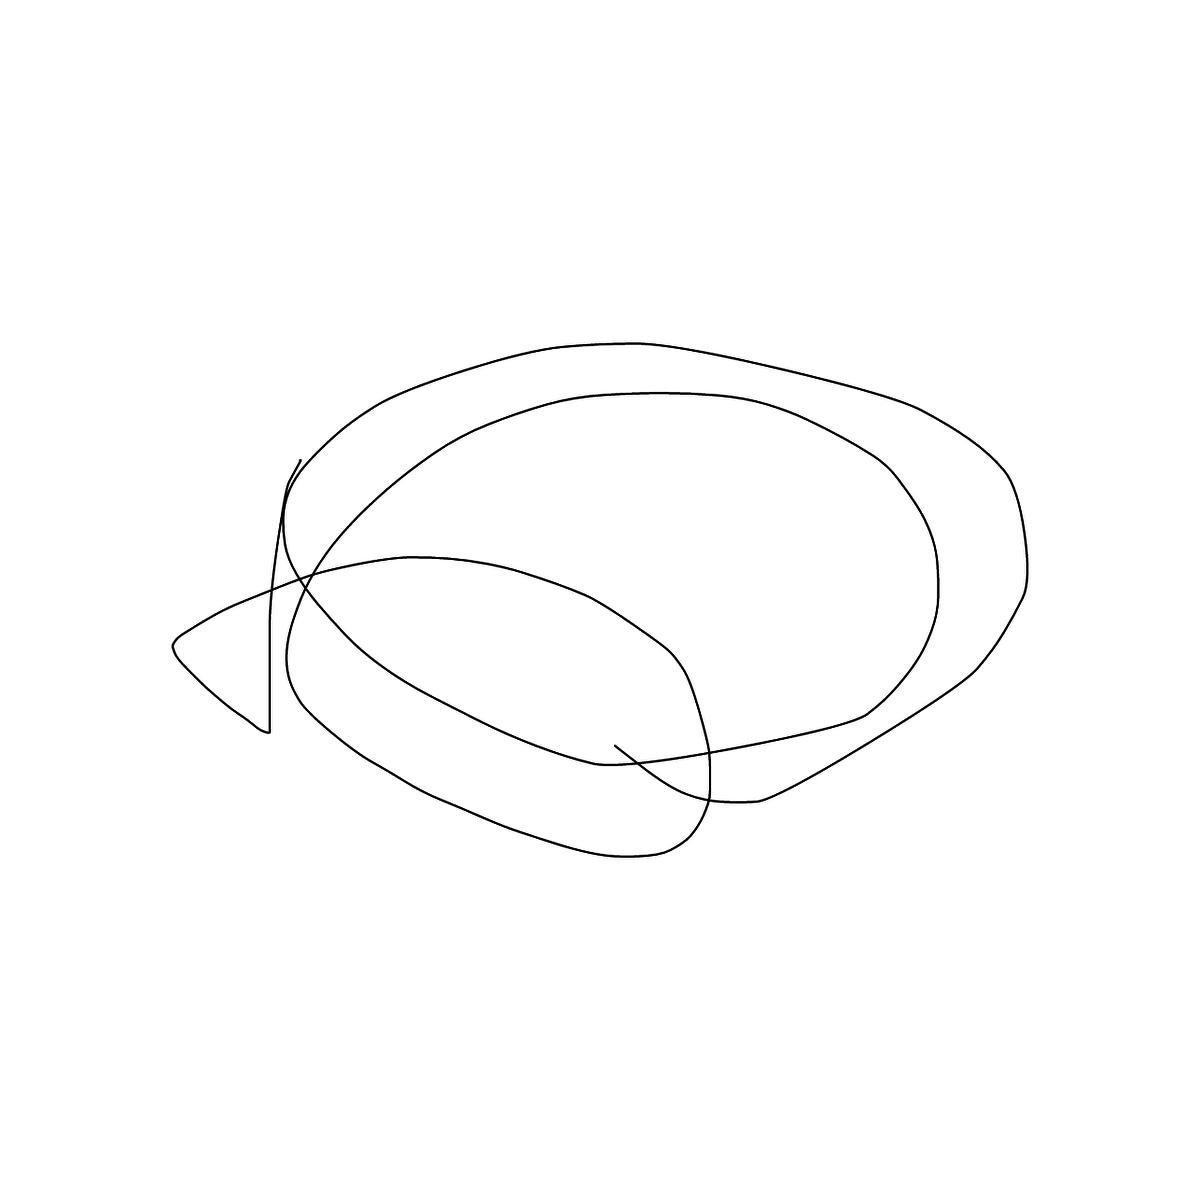 BAAAM drawing#22406 lat:35.6070938110351560lng: 139.5834808349609400